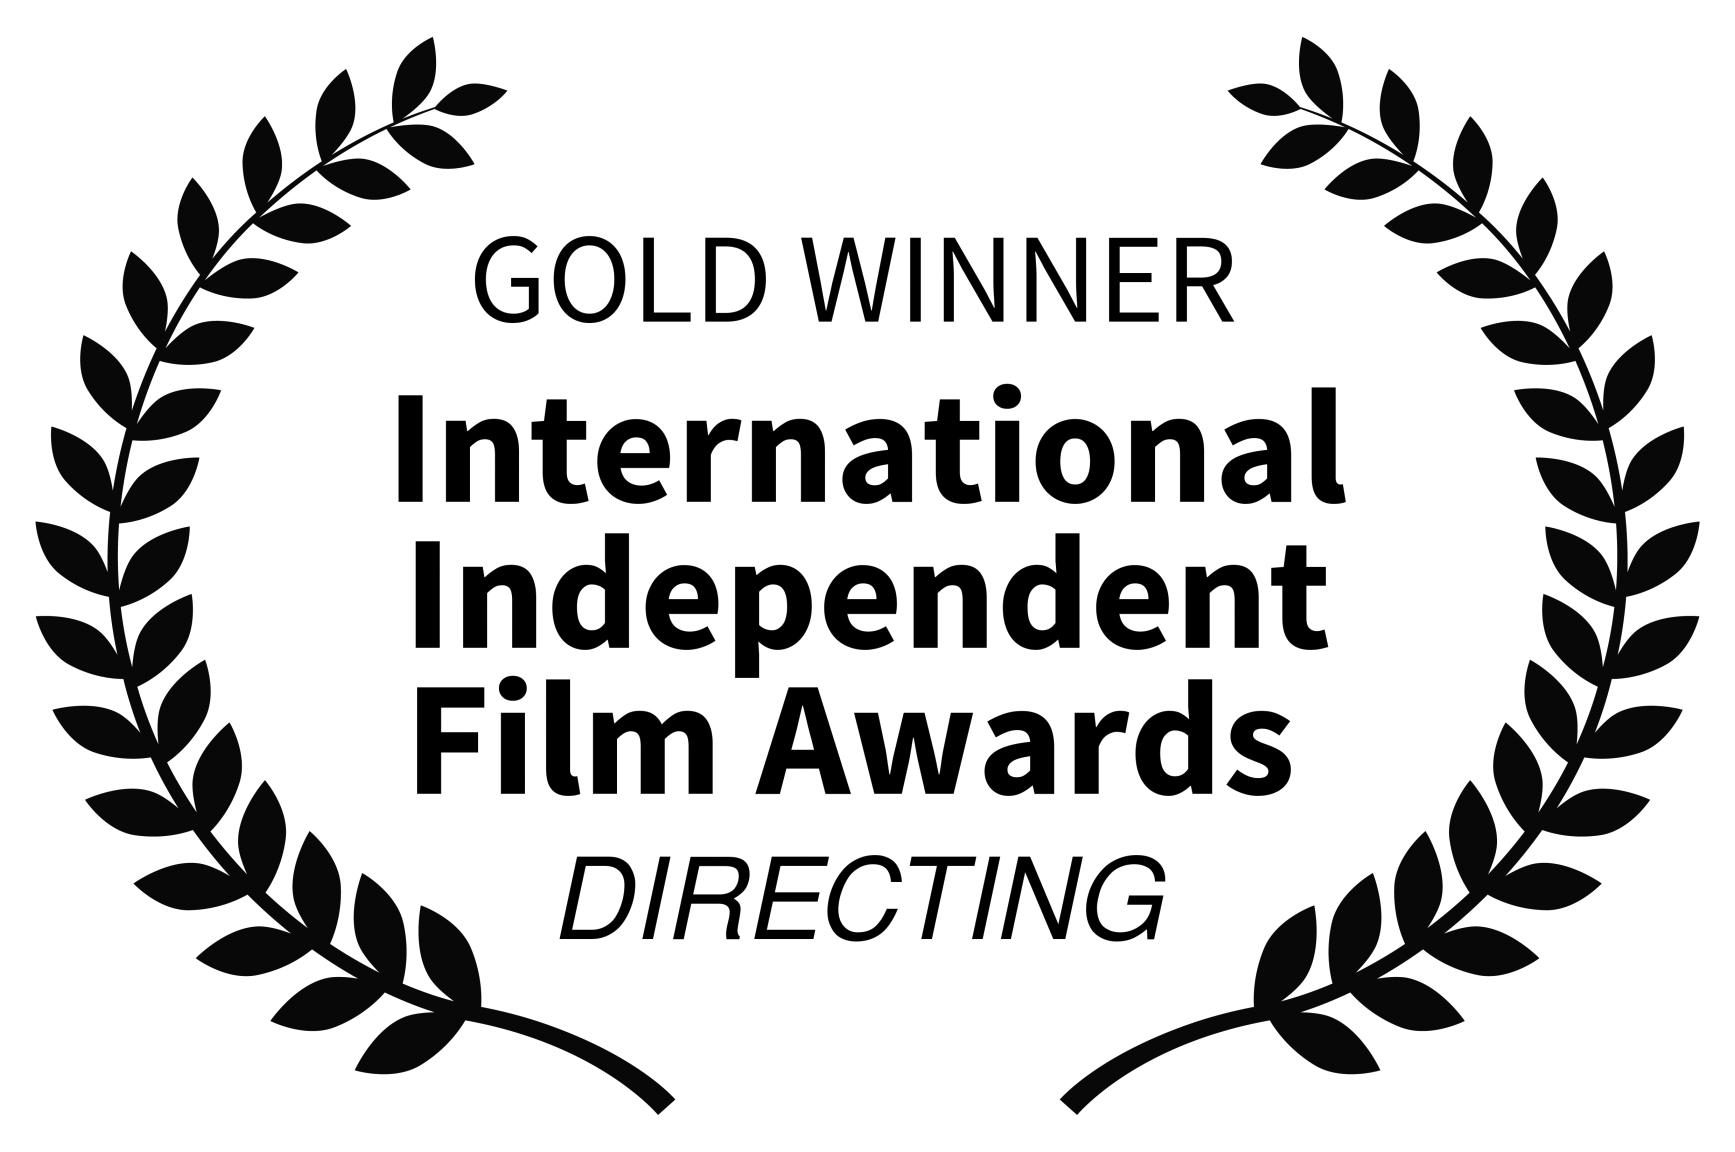 GOLD WINNER  - International Independent Film Awards  - DIRECTING -.jpg